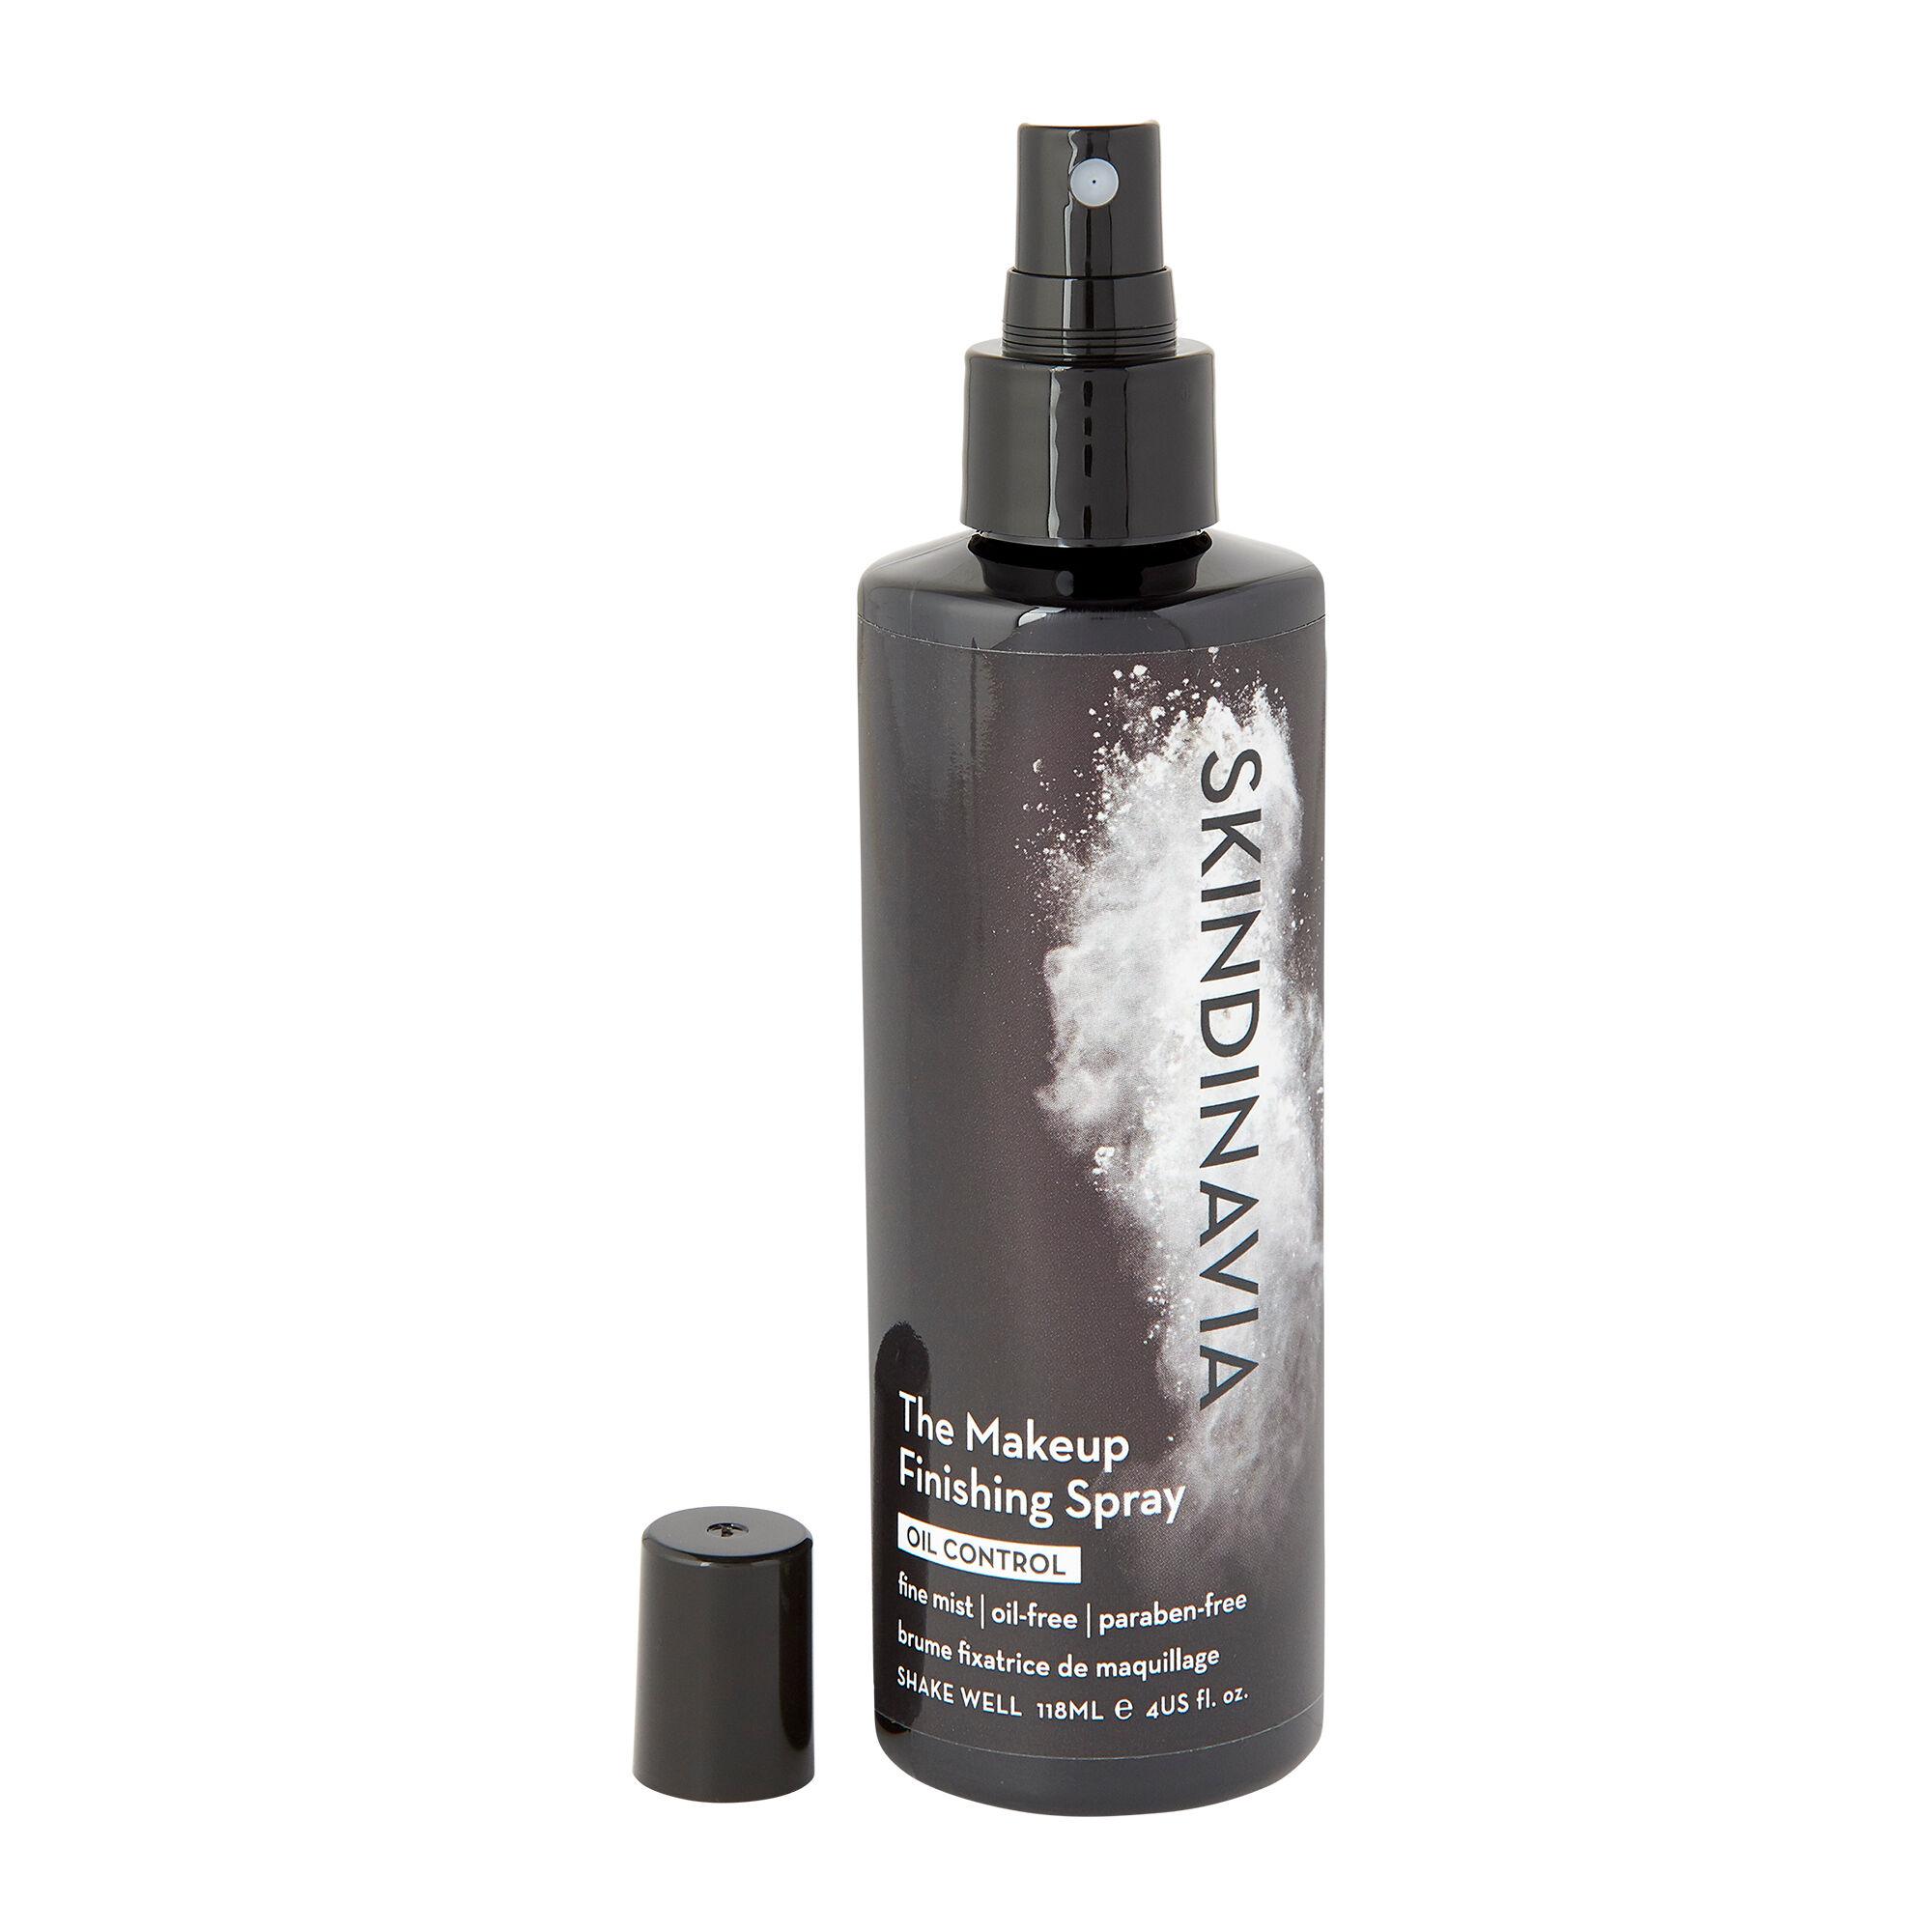 Skindinavia The Makeup Finishing Spray Oil Control 118ml 118ml